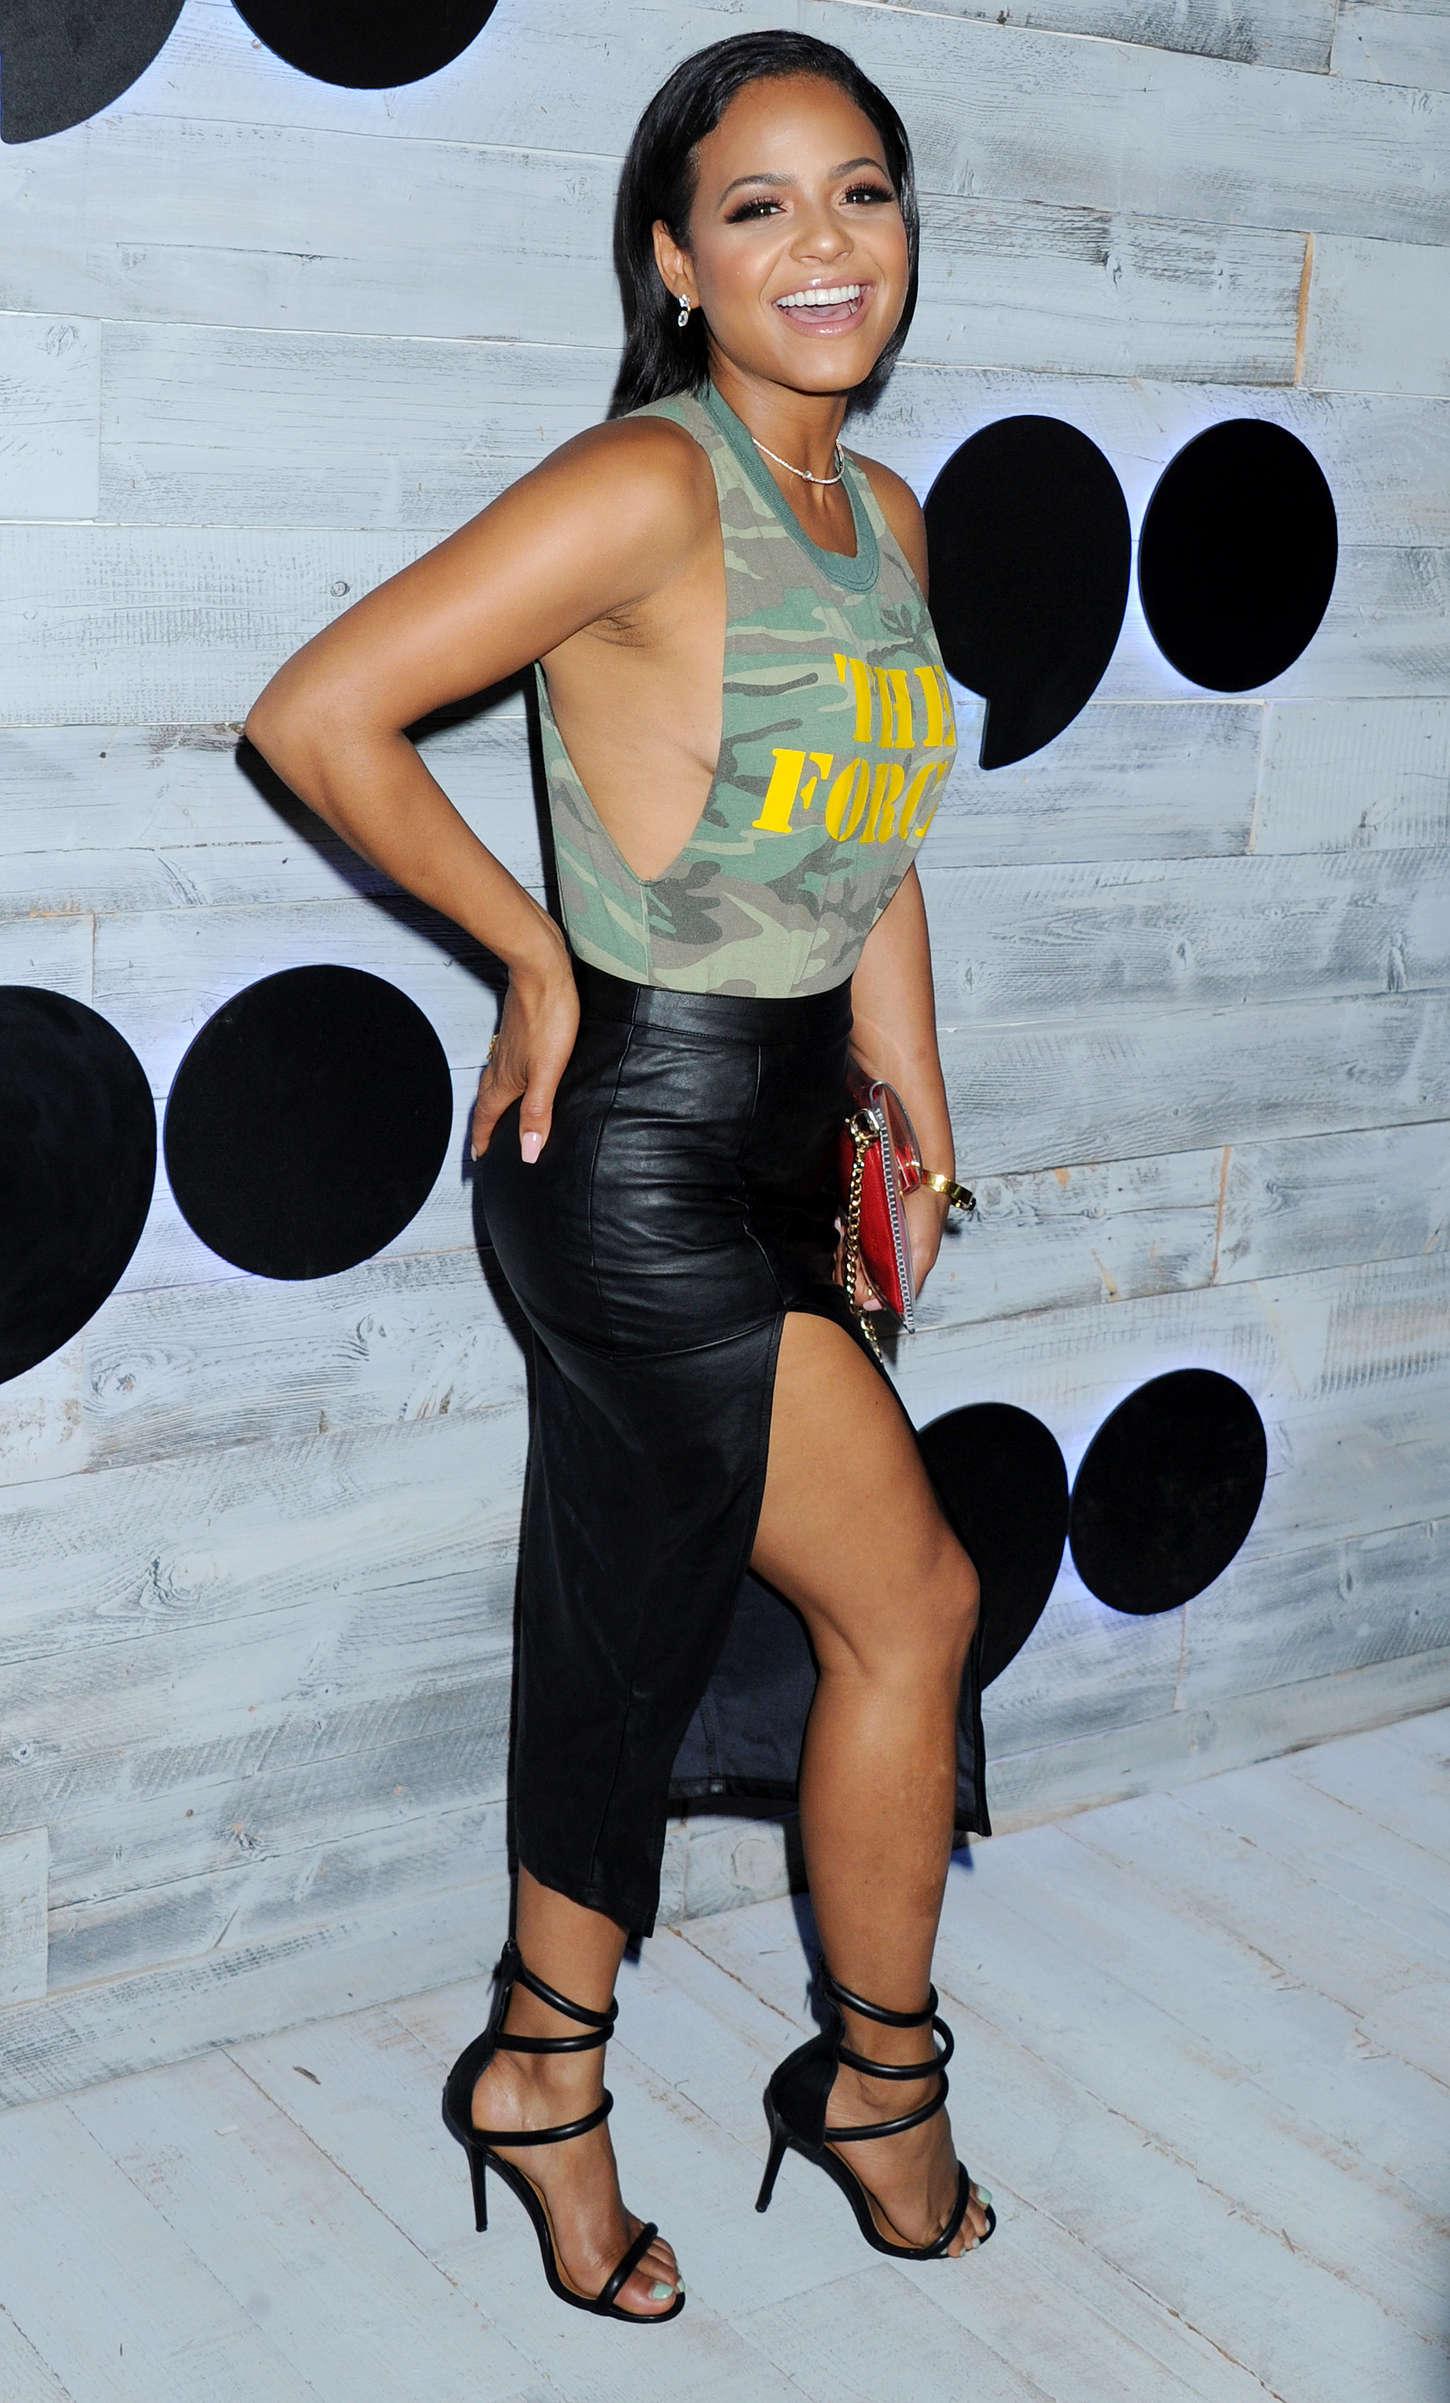 Christina Milian 2015 : Christina Milian: go90 Social Entertainment Platform Sneek Peek -10